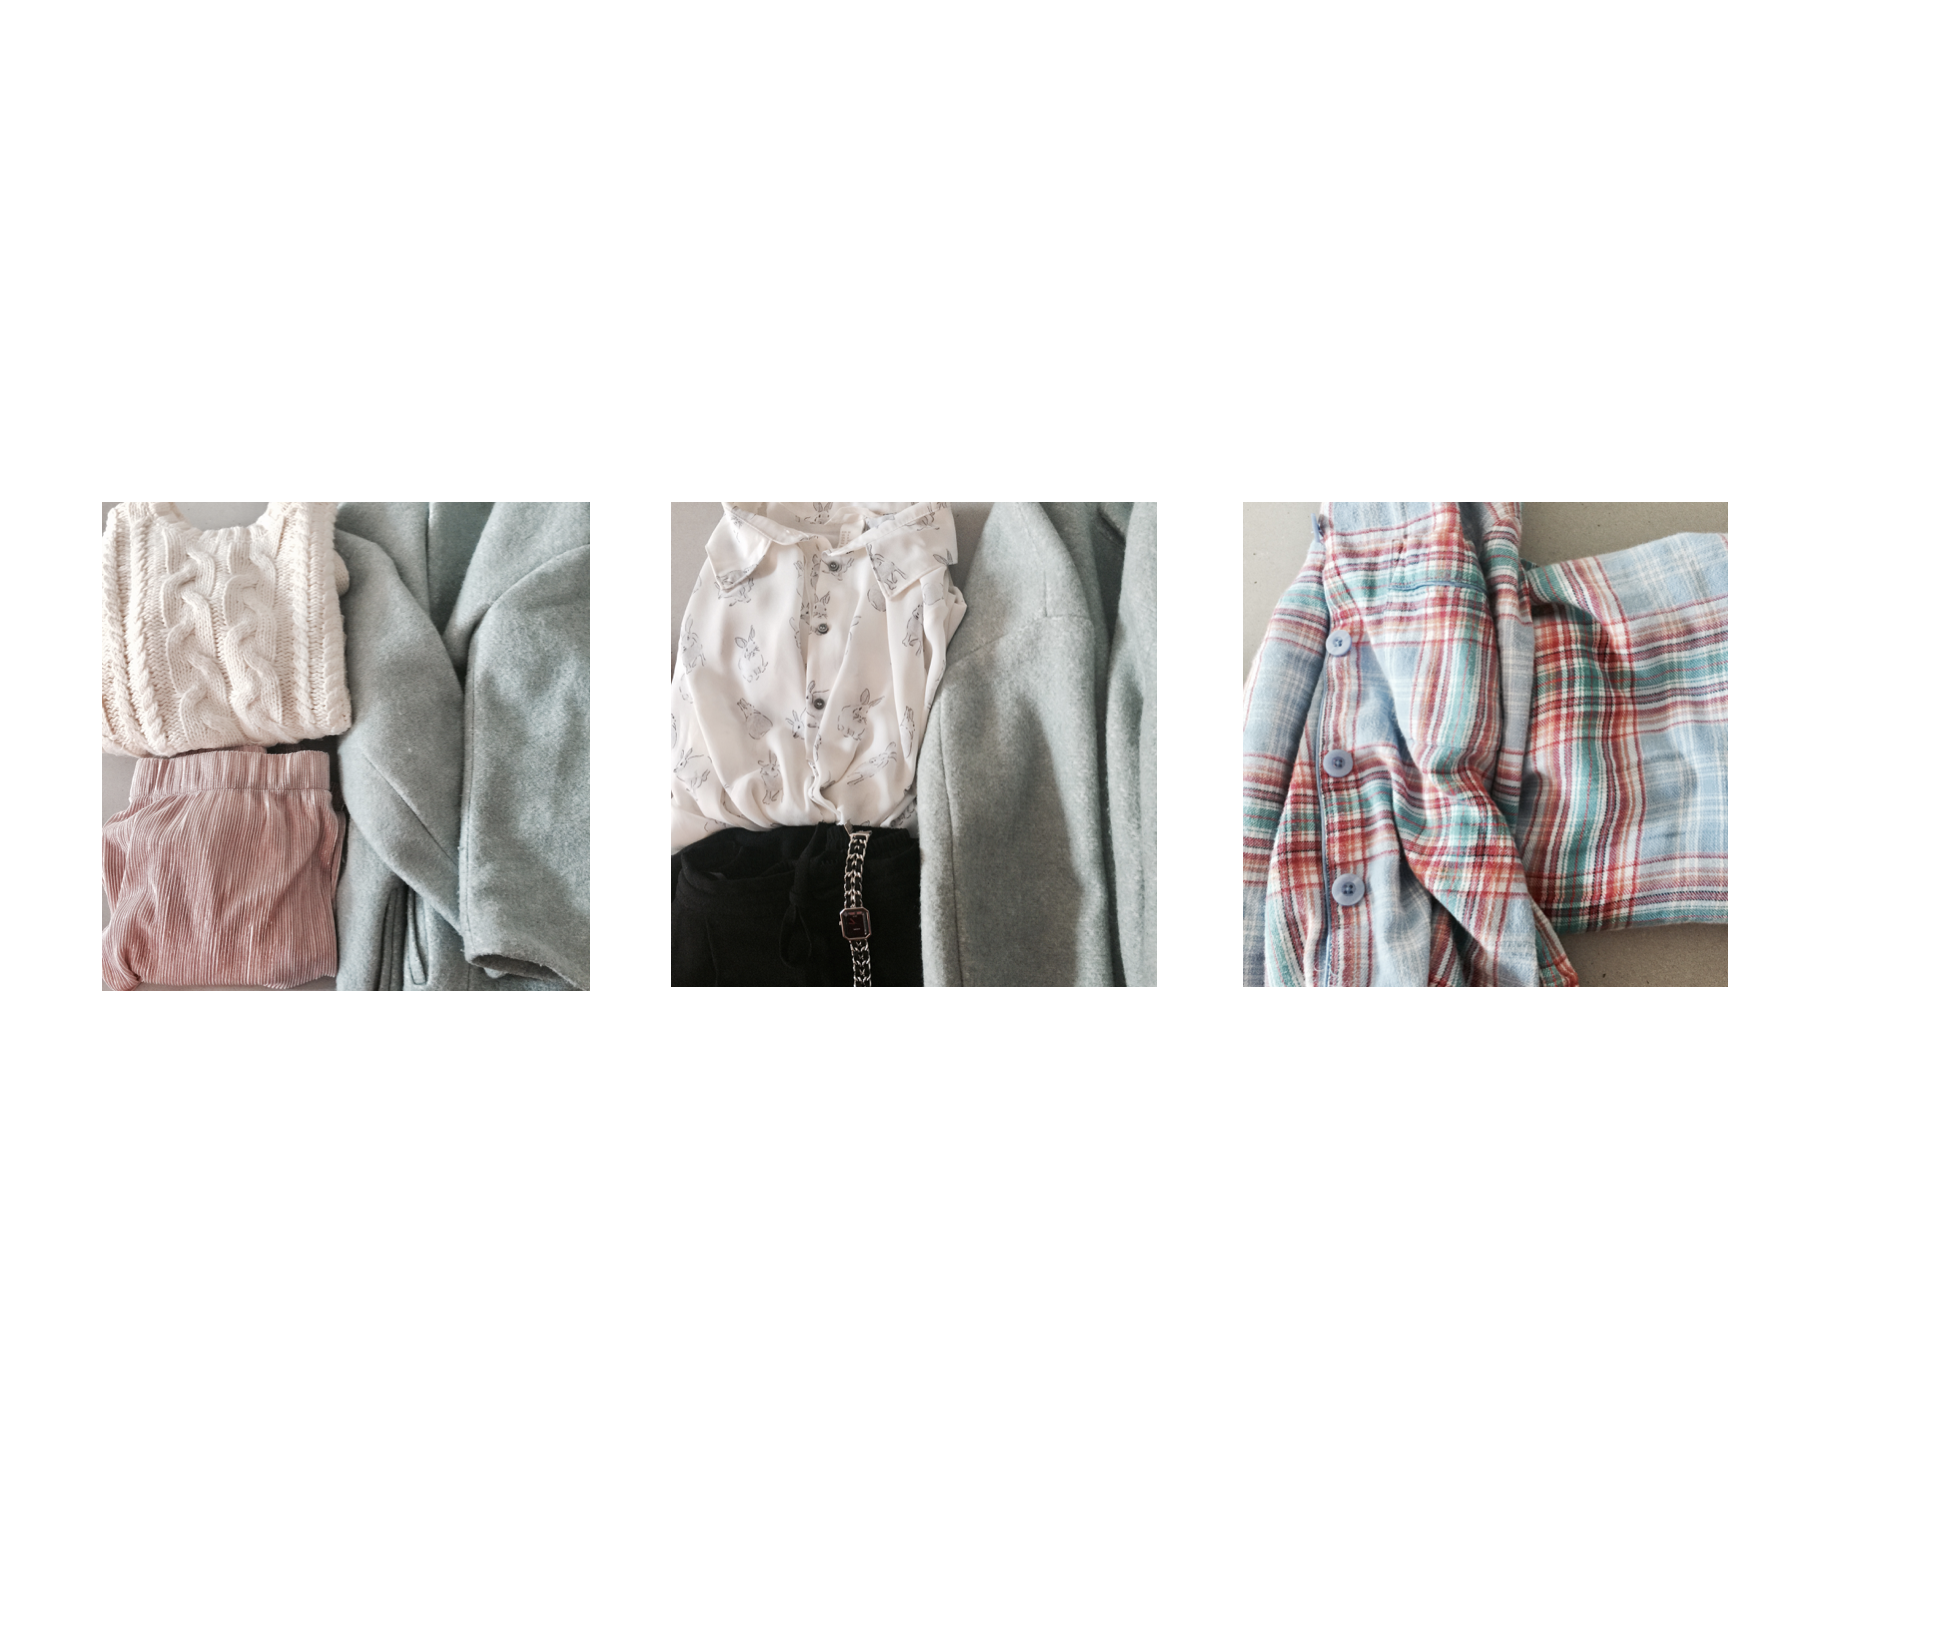 Fashion Studies: Post#3 Dress Practice Log Reflection